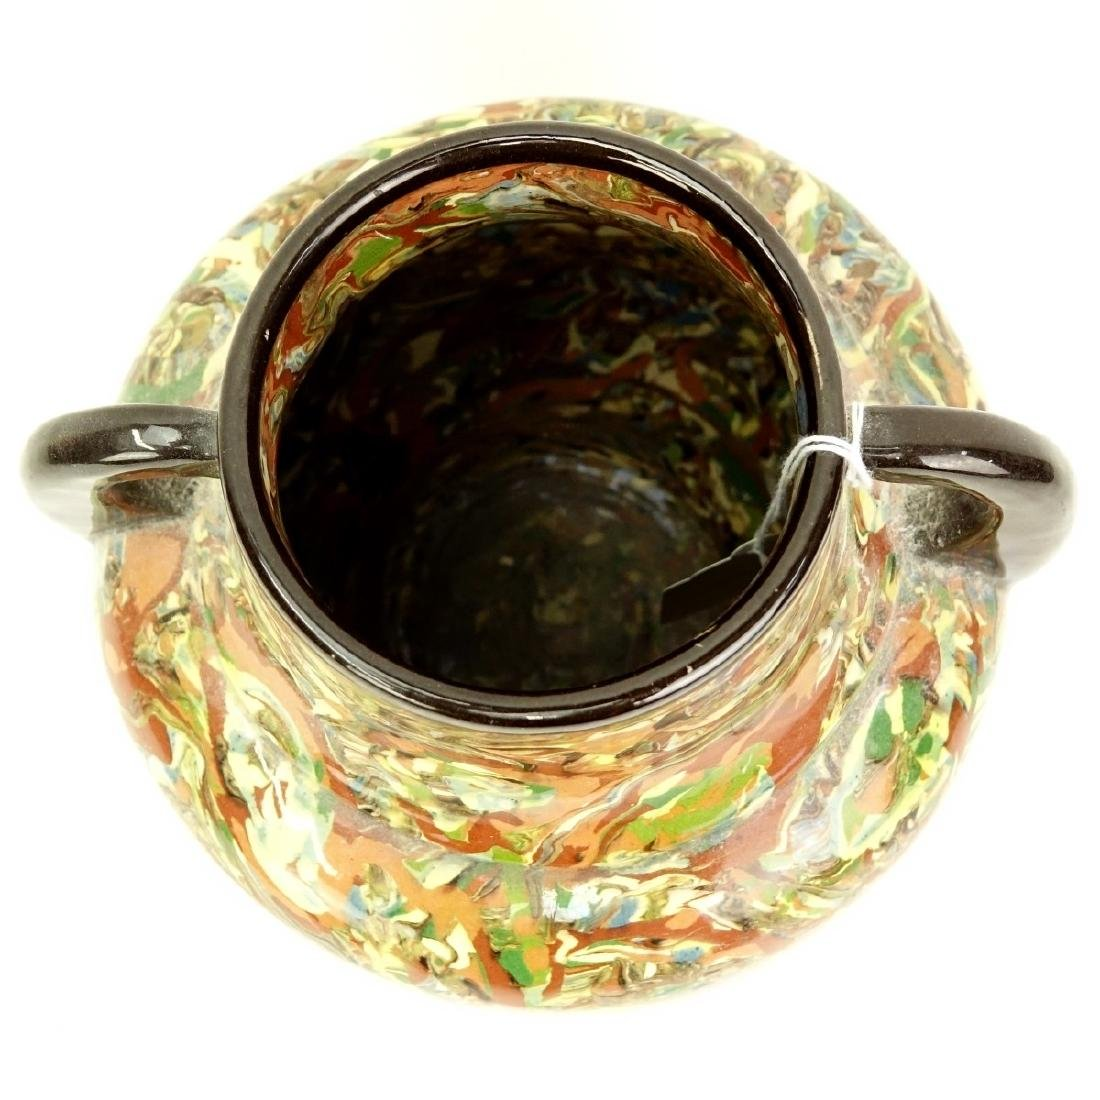 Modern Greek Style Handled Glazed Pottery Jar - 2